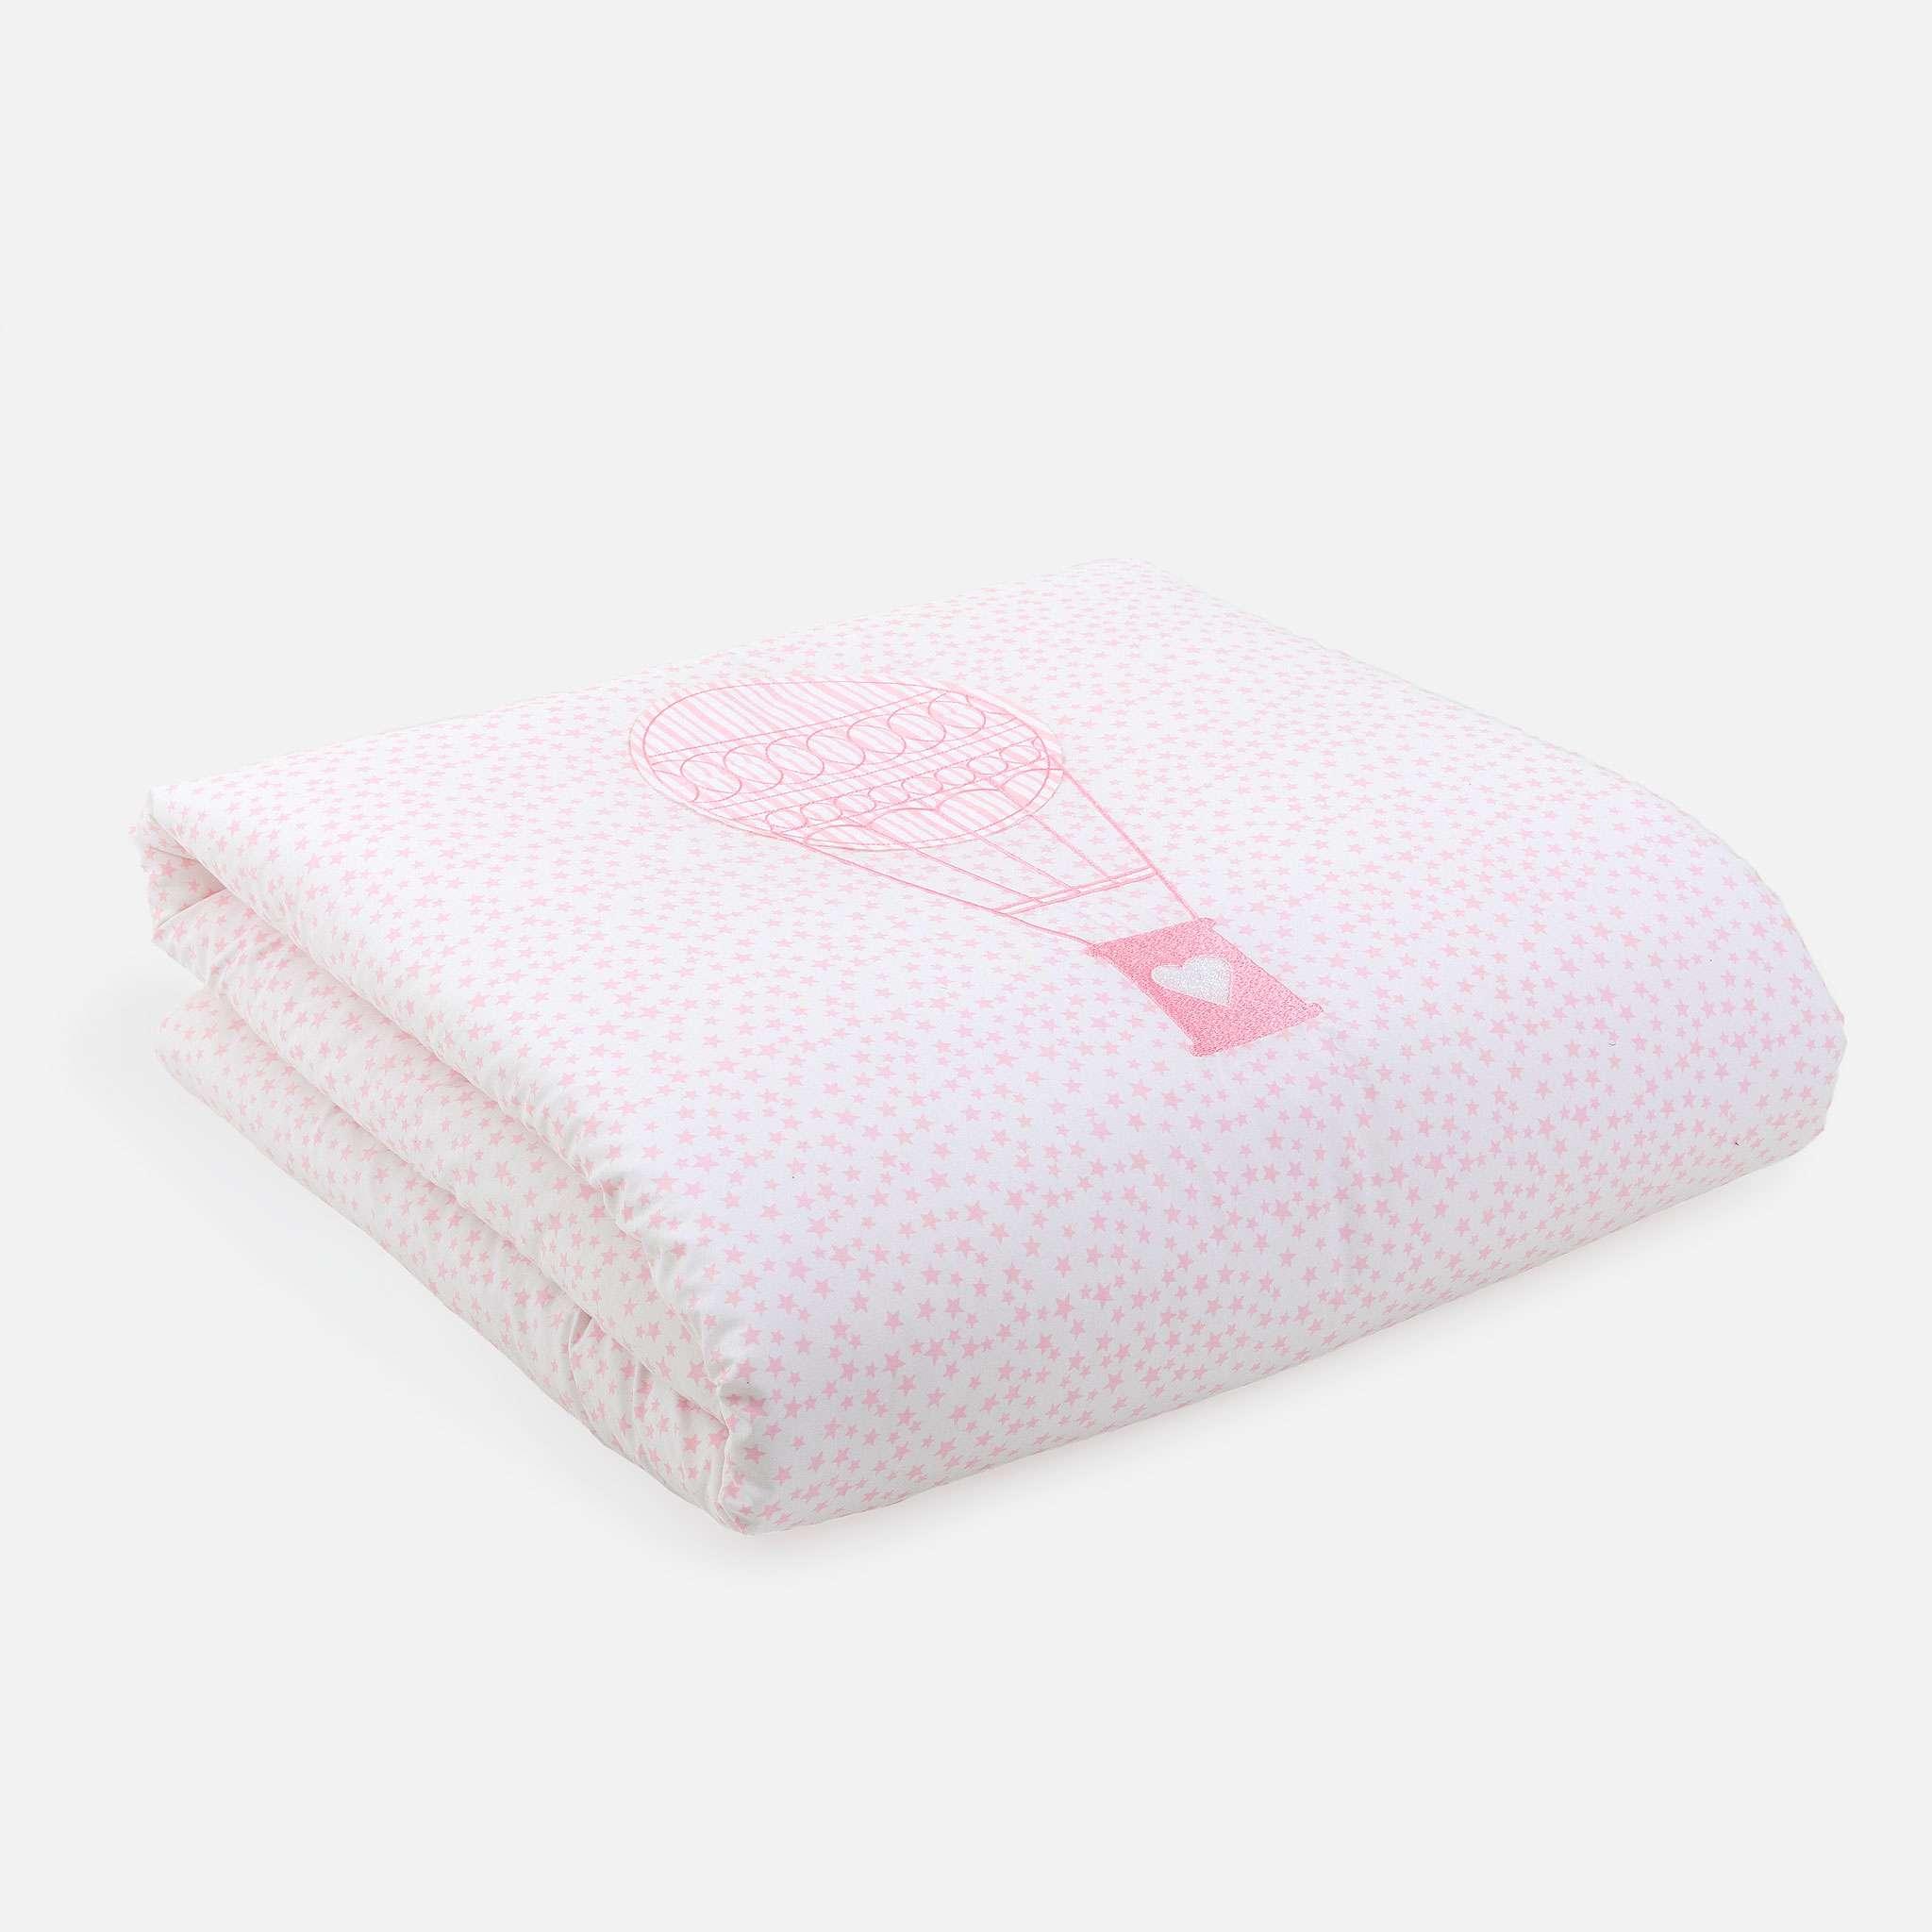 Bettüberwurf, Ballon Pink